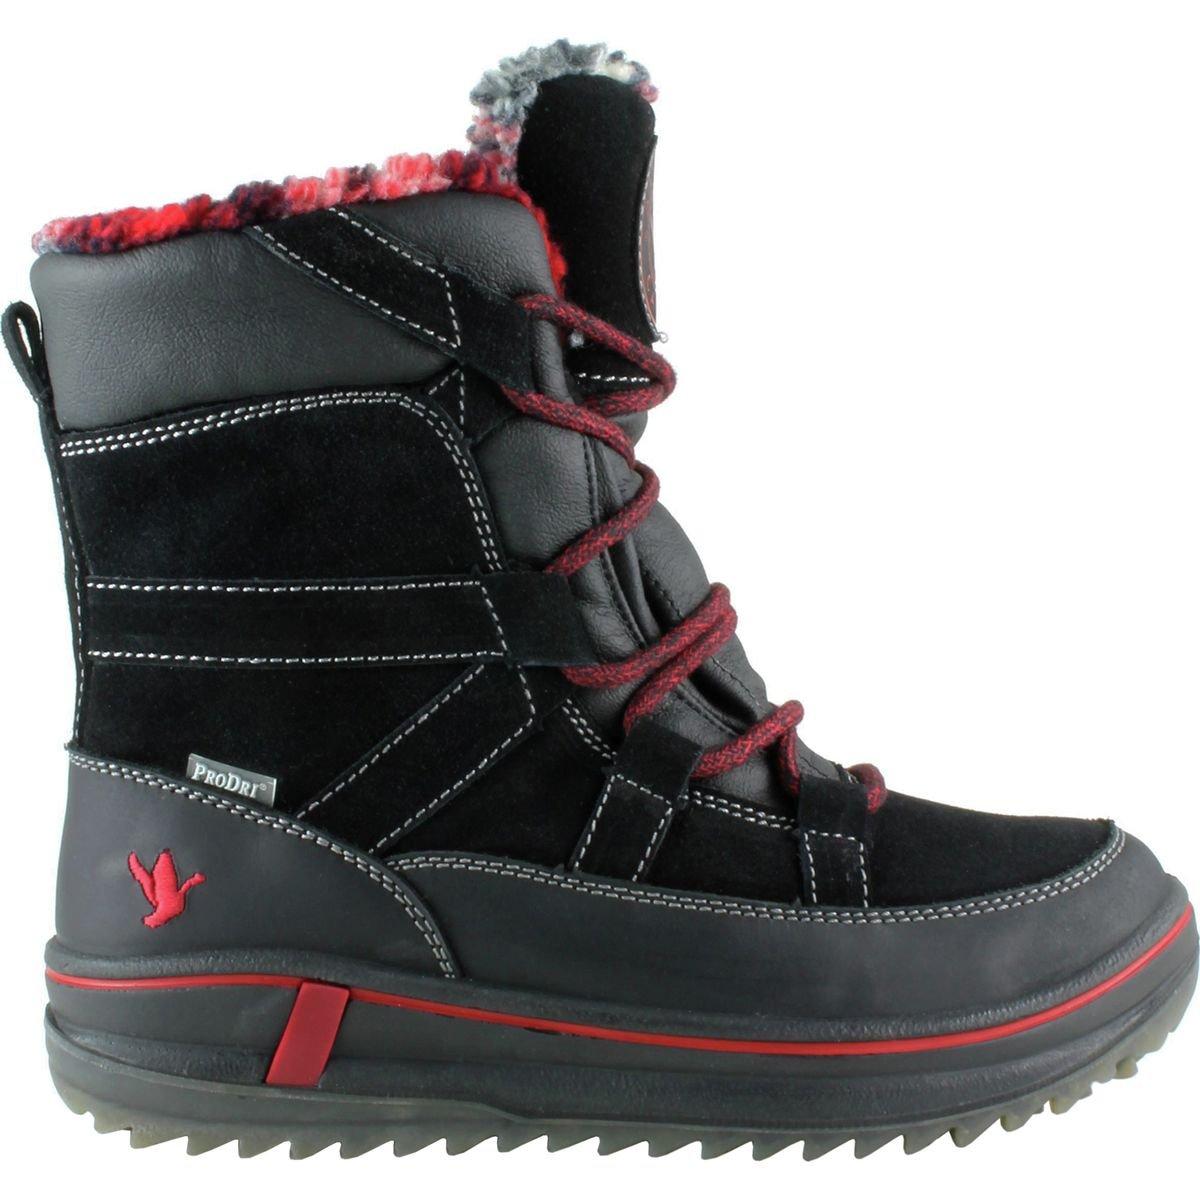 Santana Canada レディース B01LW15MWC Black Crazy Horse Leather/Suede 8 B(M) US